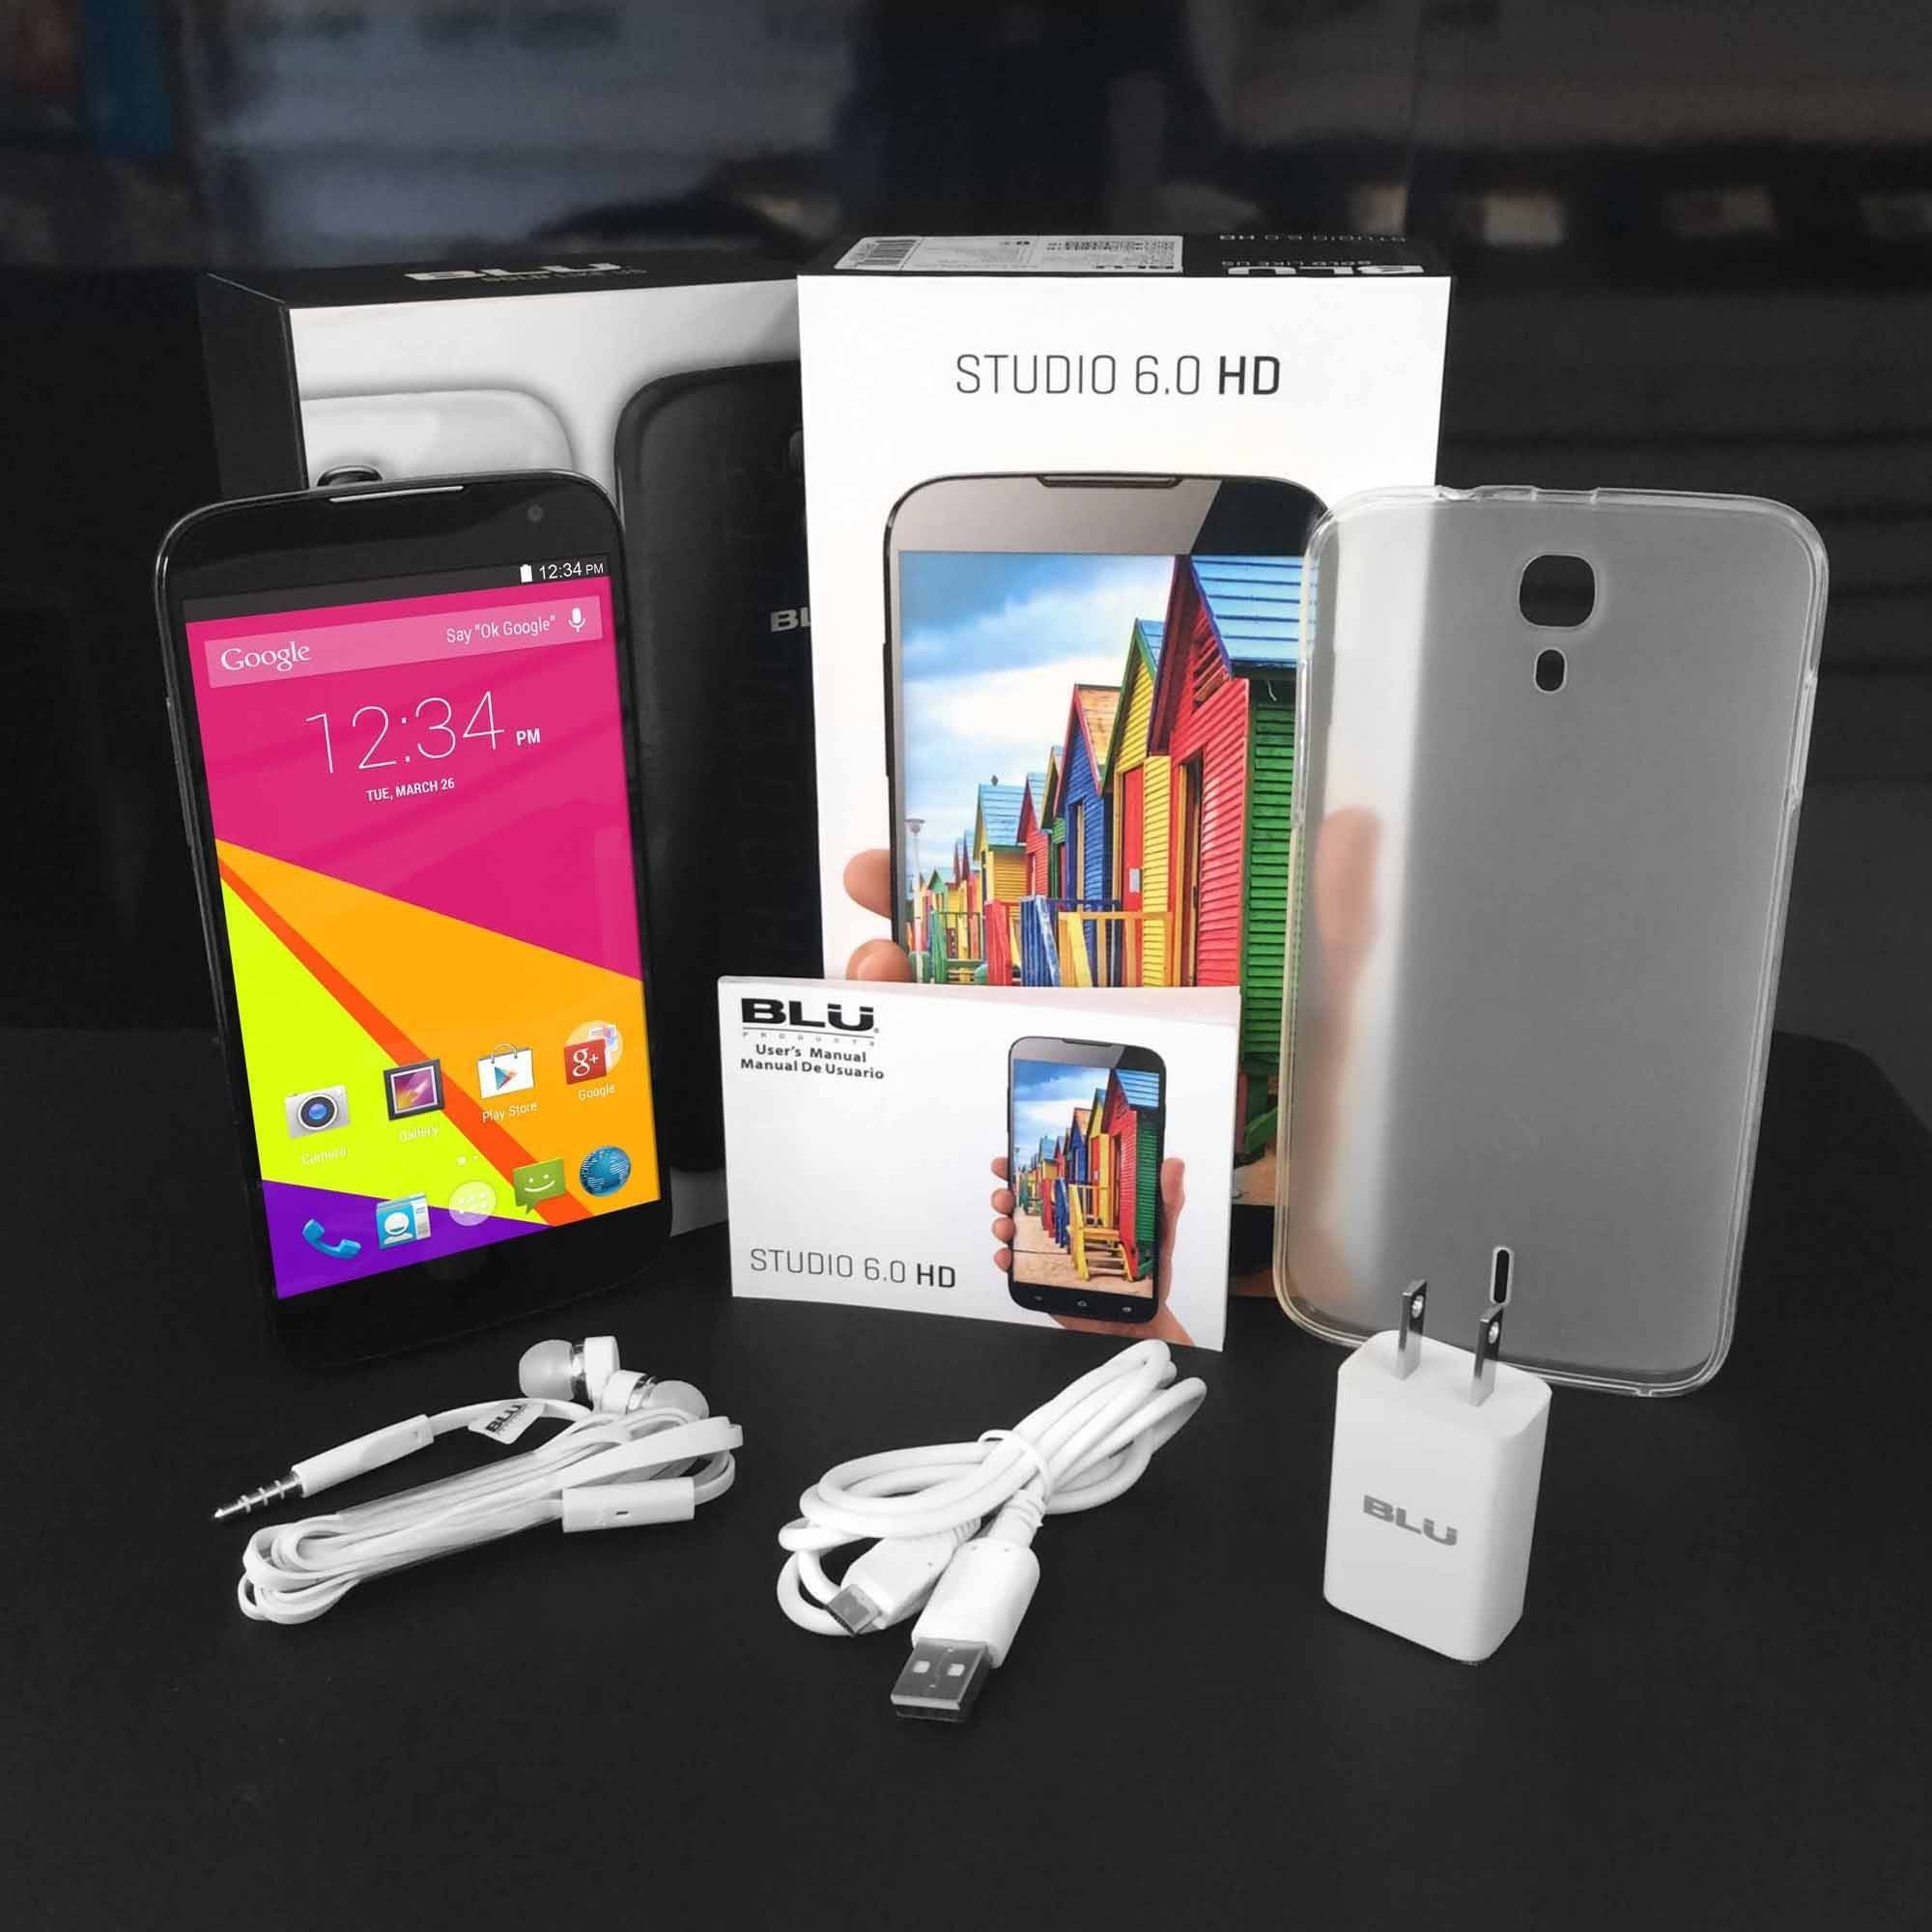 BLU Studio 6 0 HD D65IU GSM Dual SIM Quad Core Smartphone Unlocked Walmart